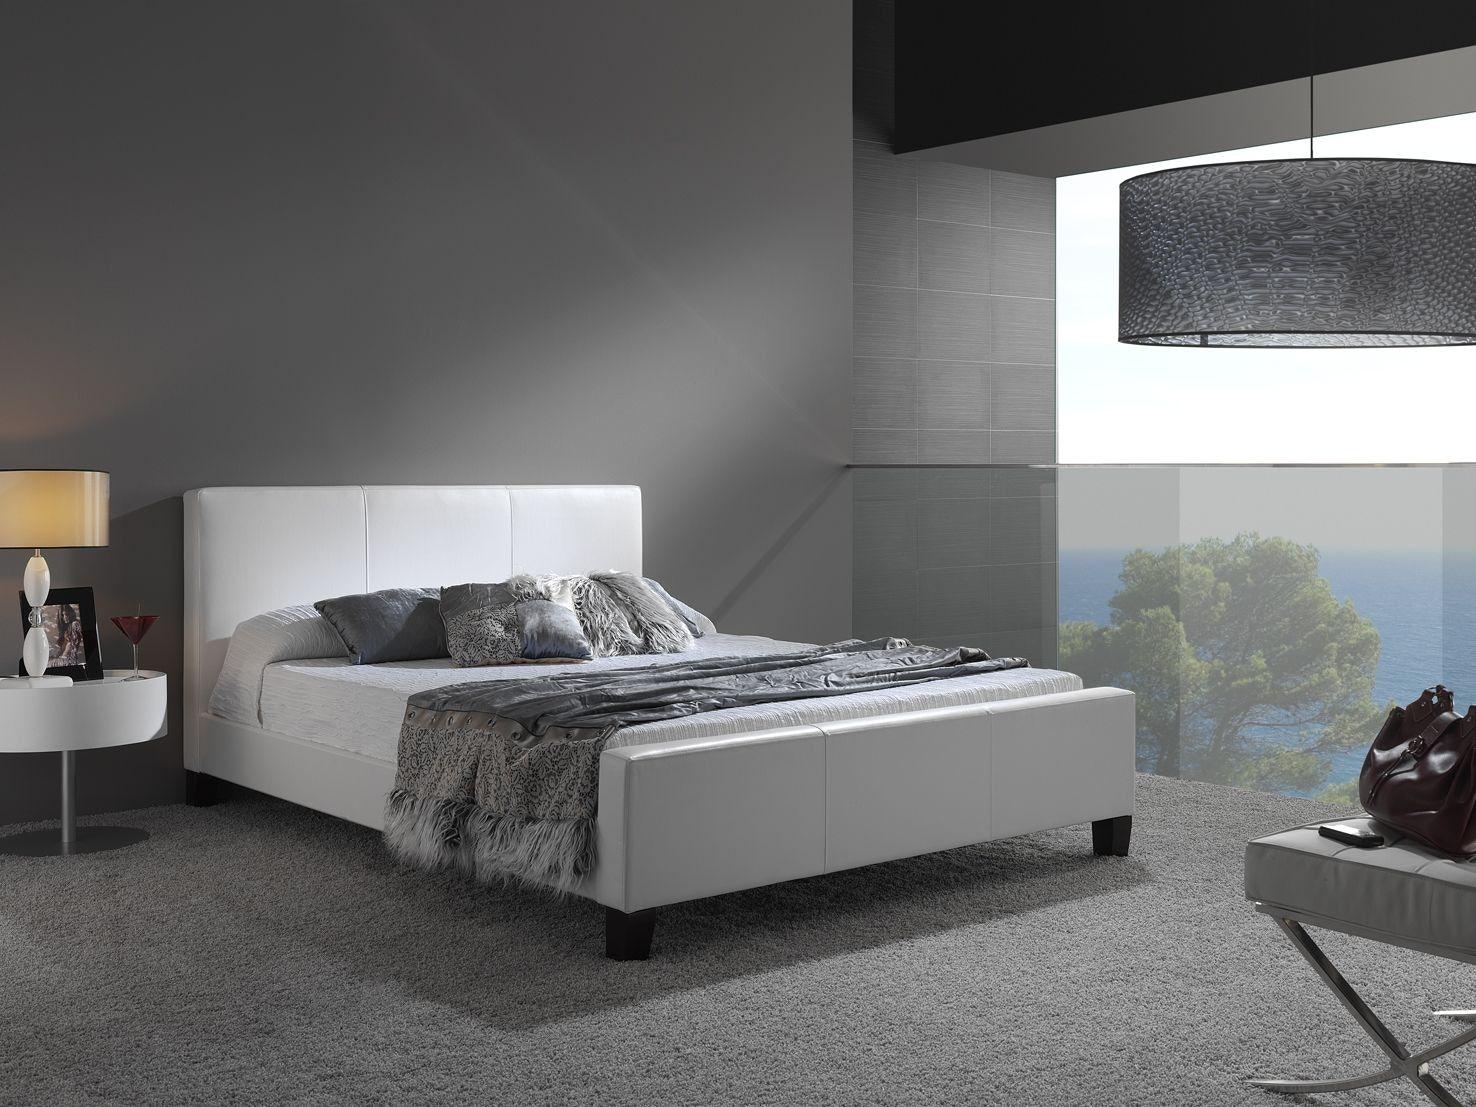 Leggett Platt Bedroom Euro Complete Faux Leather Upholstered Platform Bed And Bedding Support